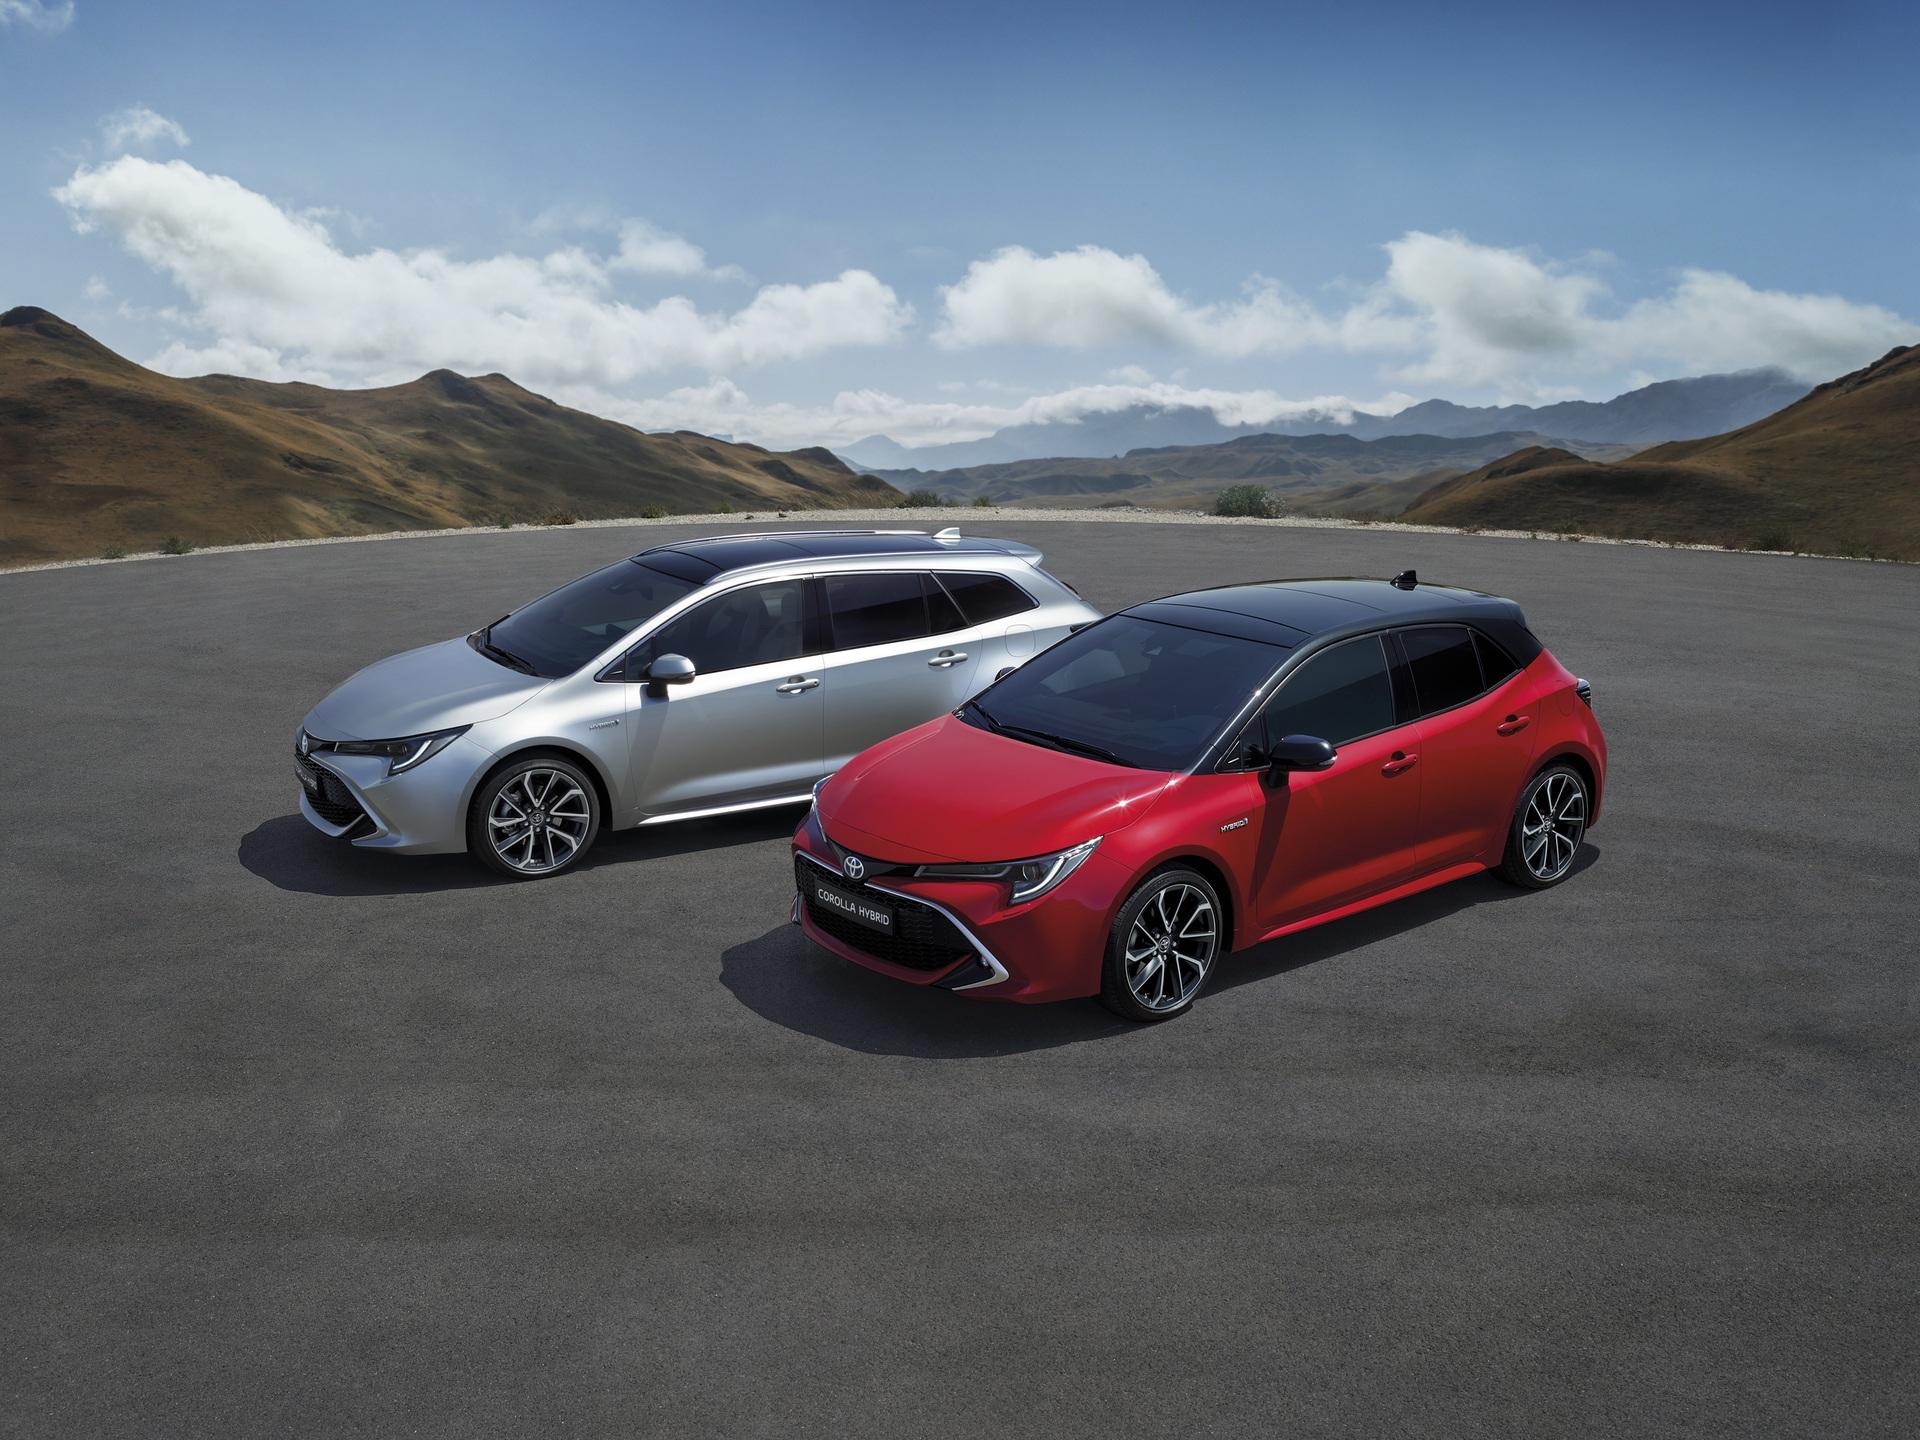 2019_Toyota_Corolla_Family_06 2